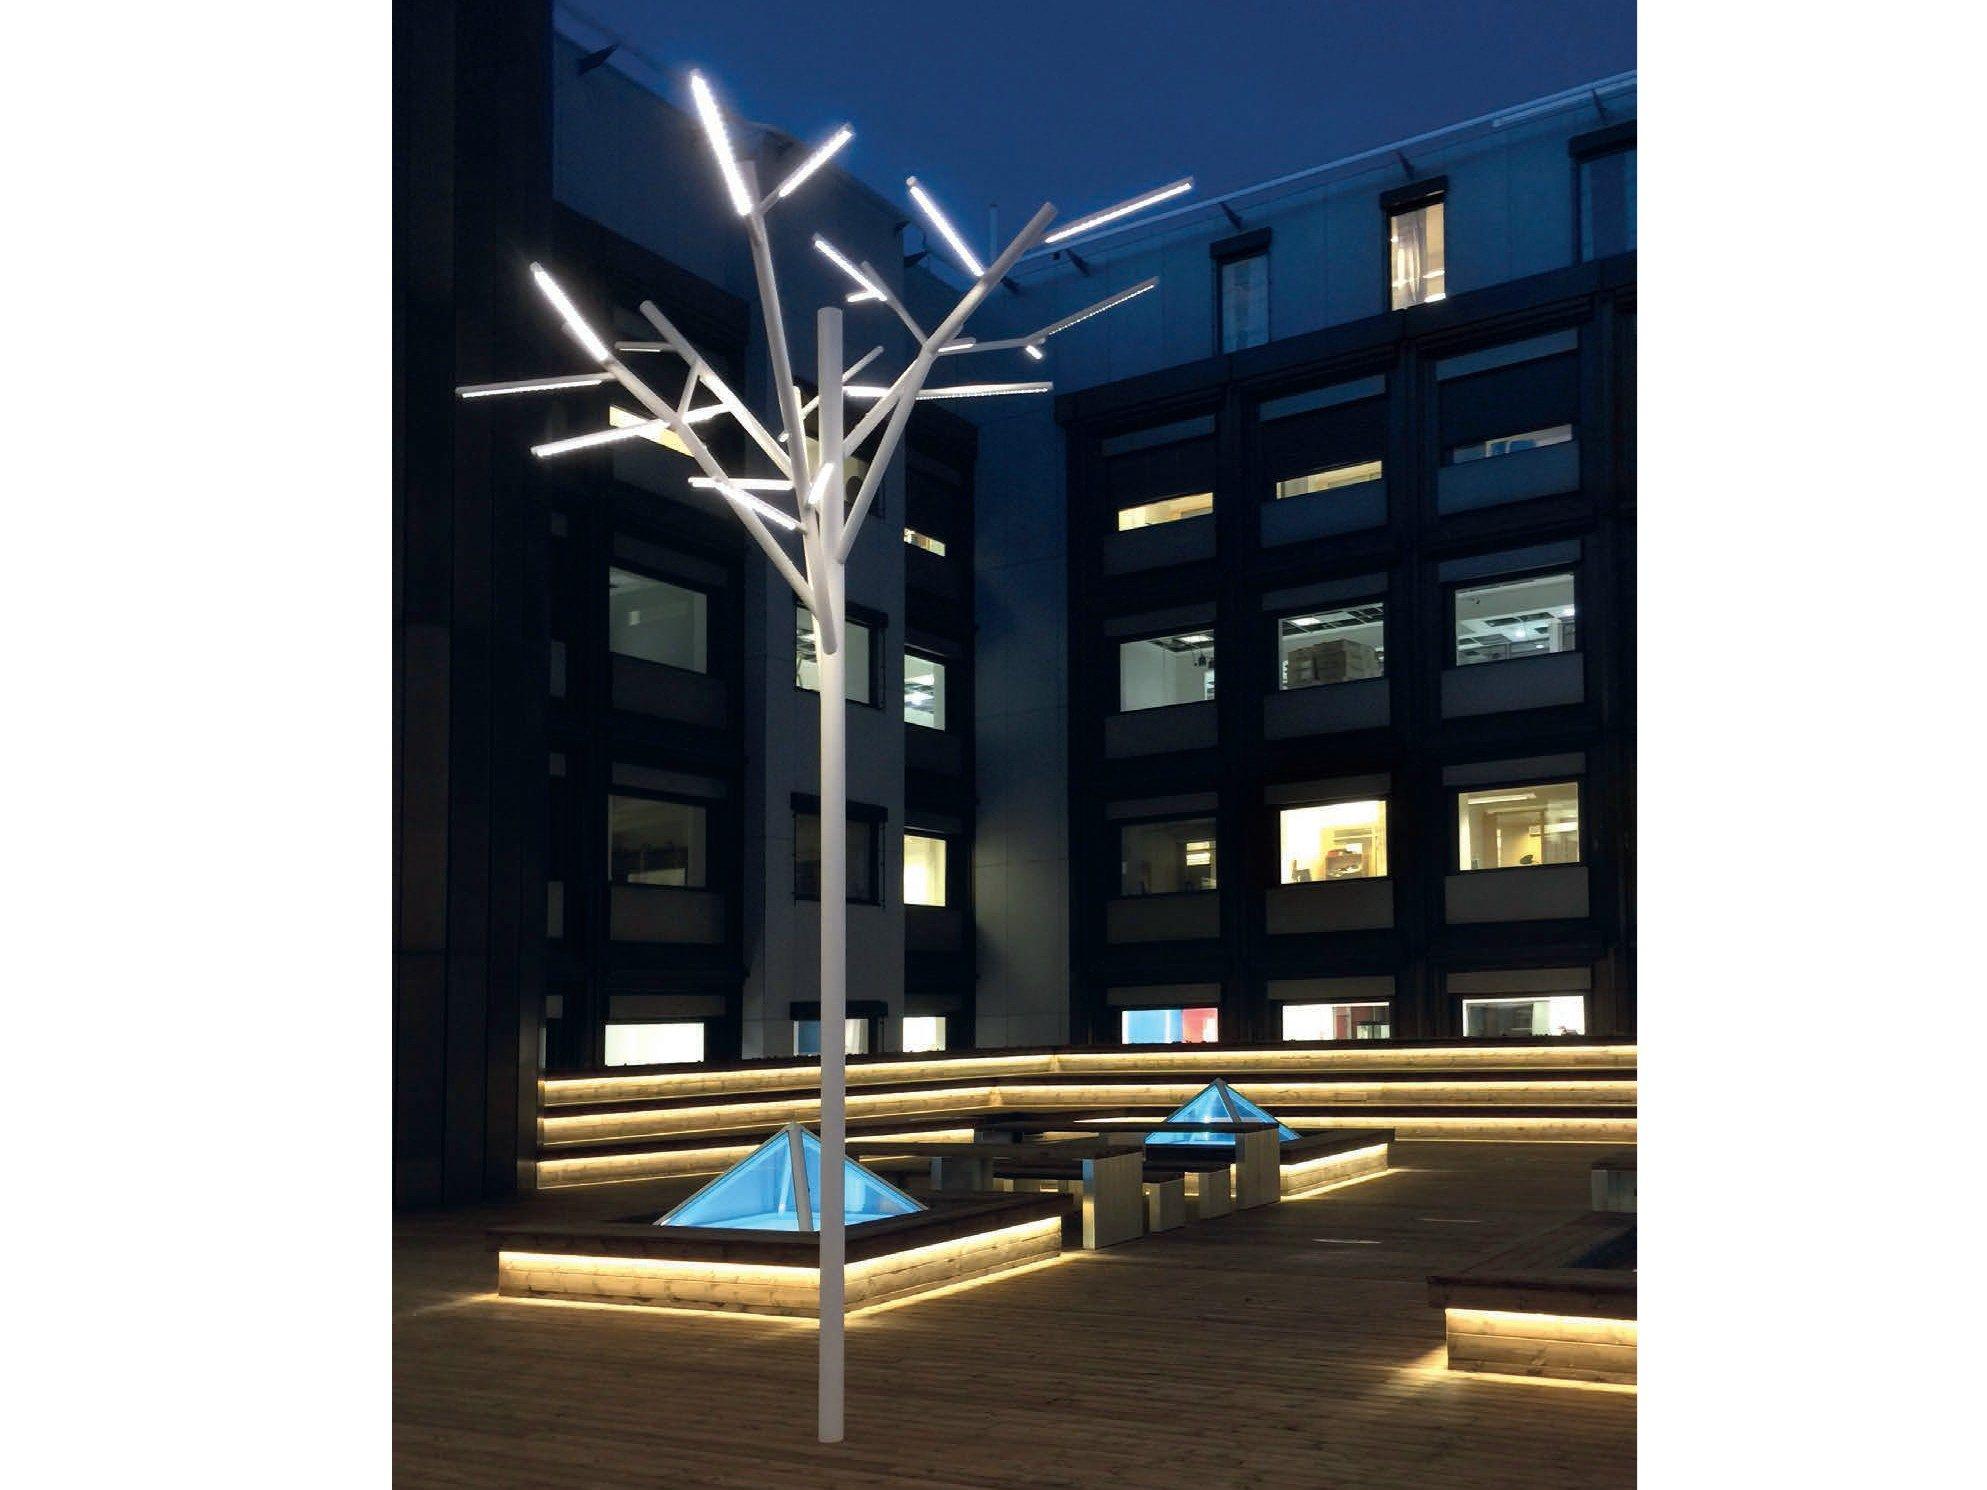 Led decorative lighting albero by iguzzini illuminazione design